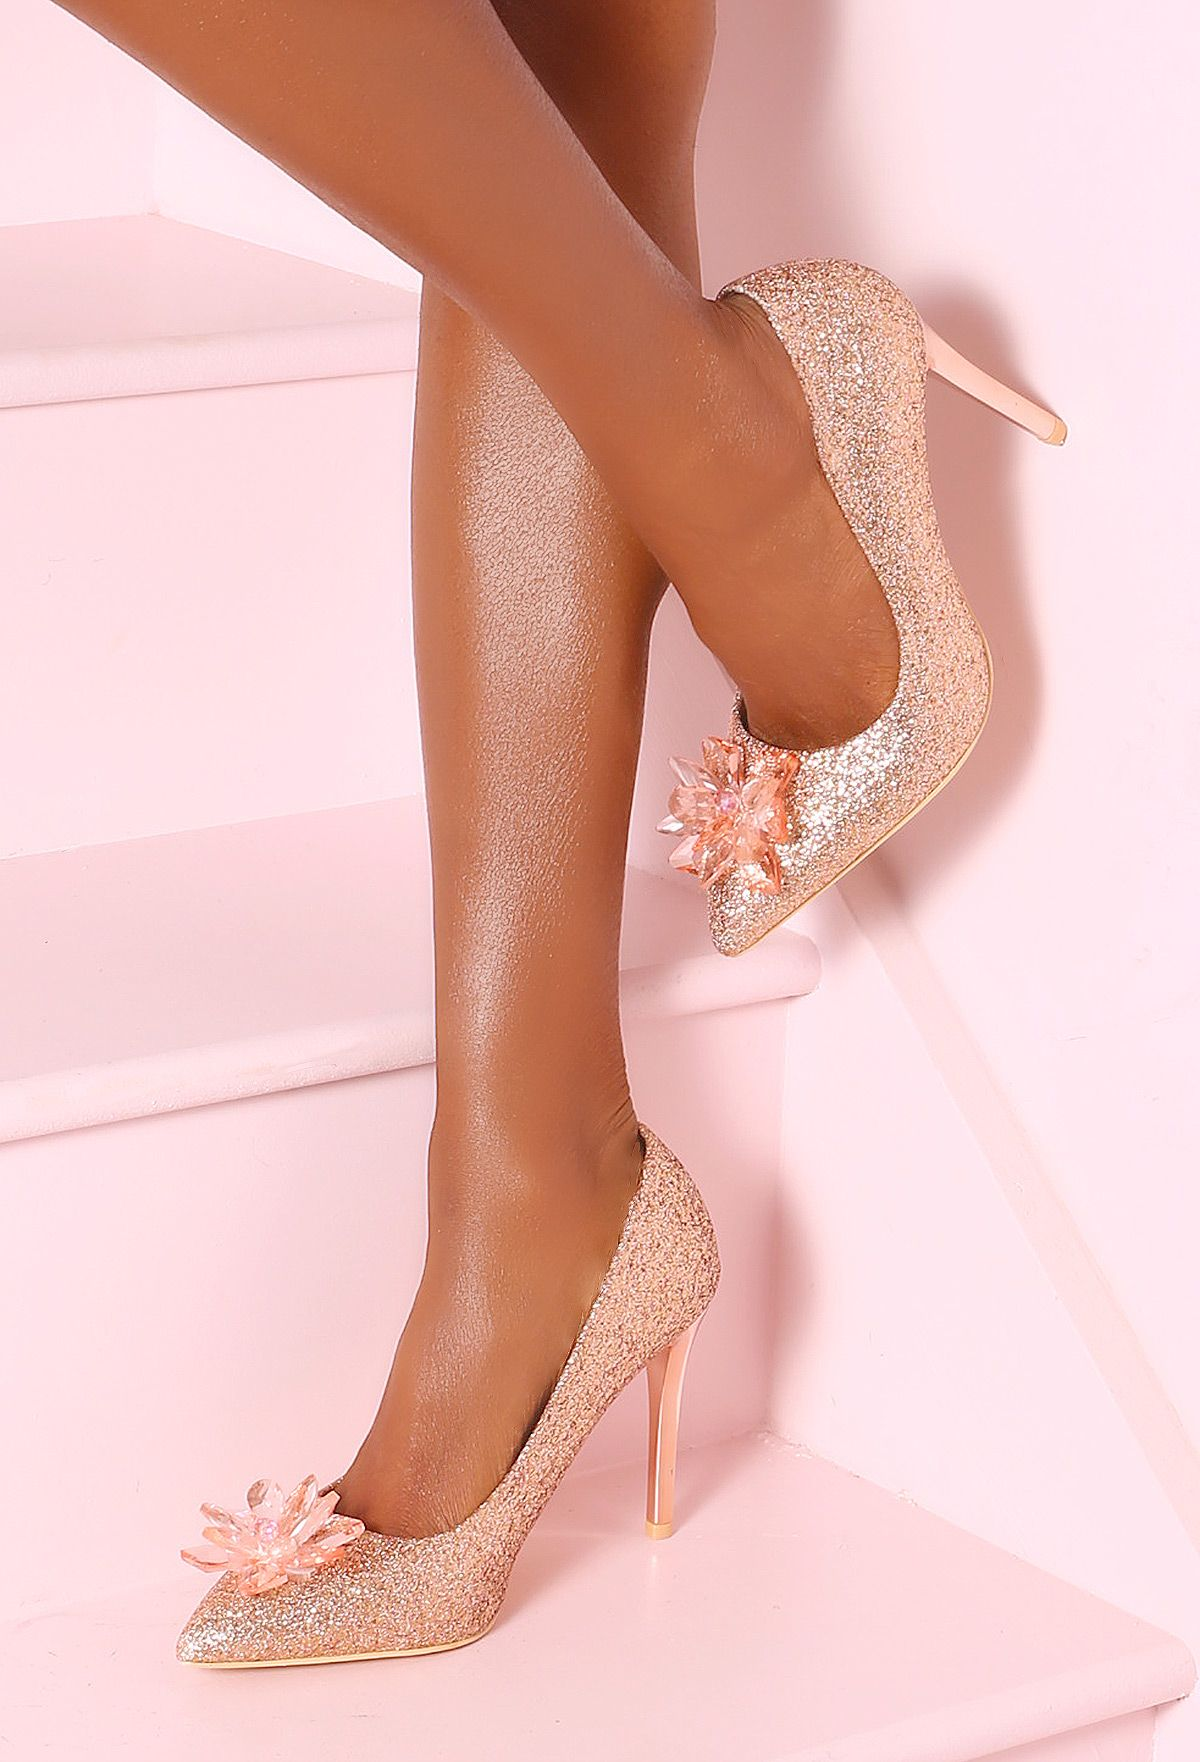 Elegant bunion shoes | Heels, Bunion shoes, Kitten heels